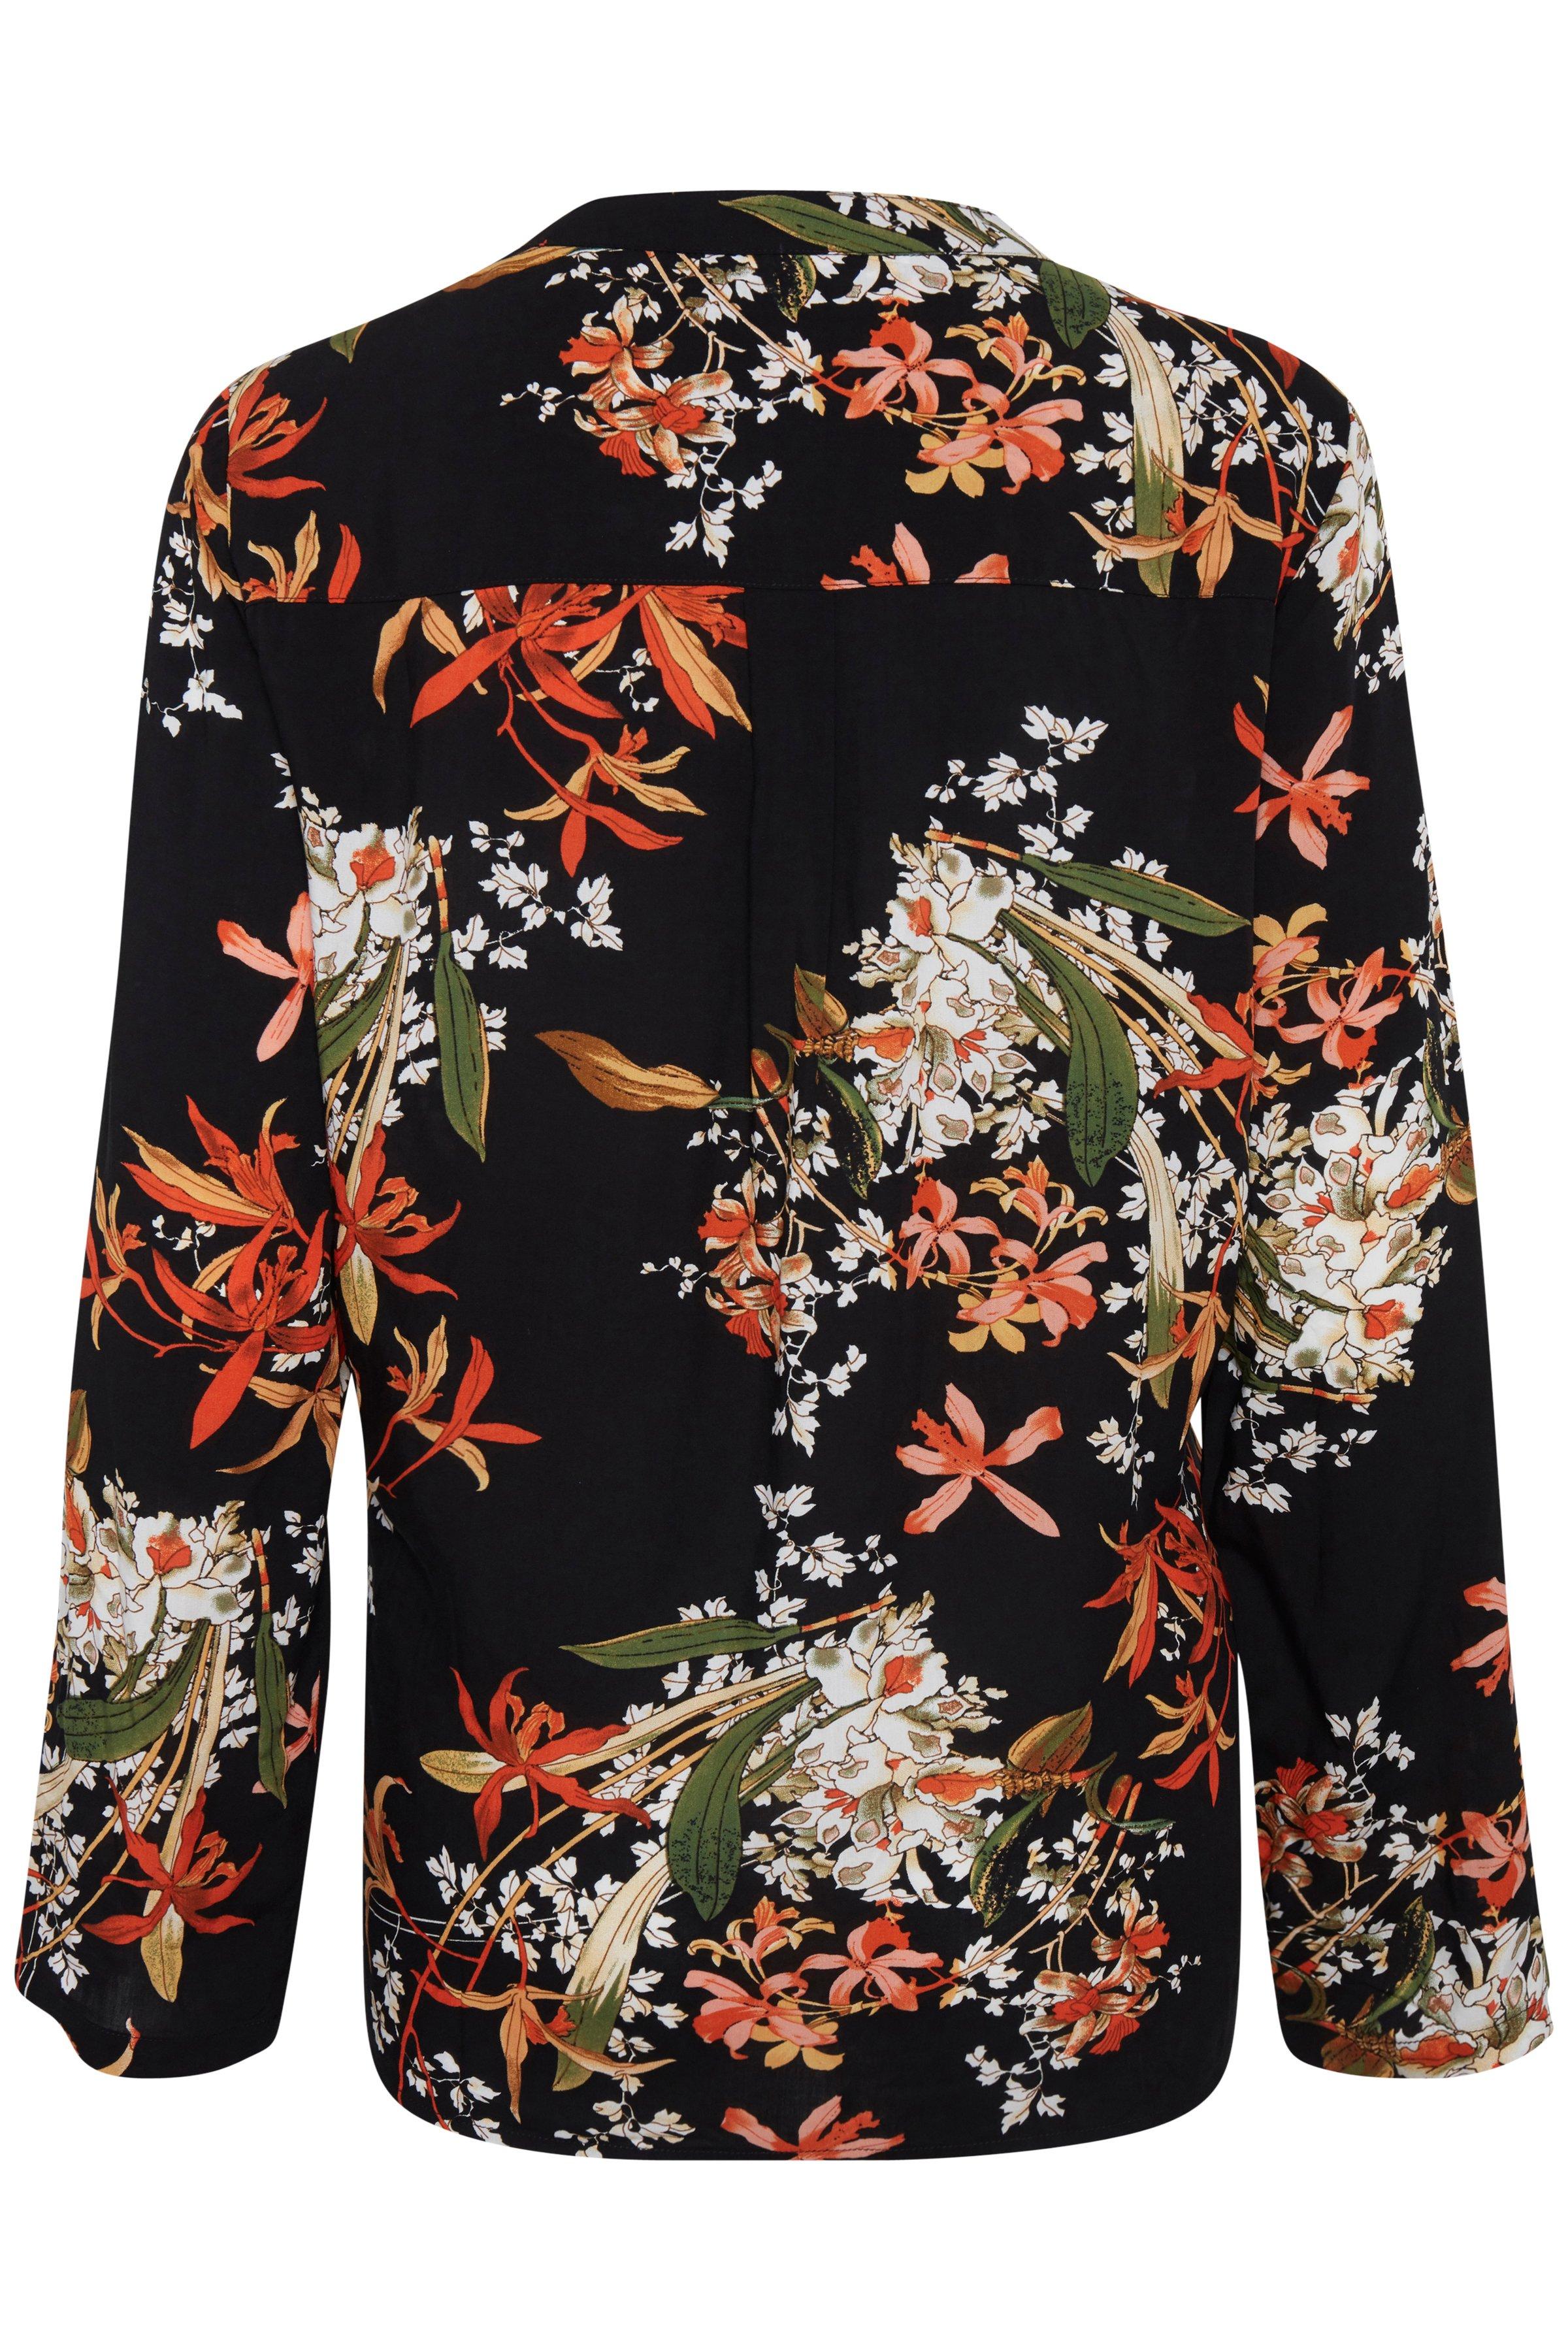 Black combi 1 Langærmet skjorte fra b.young – Køb Black combi 1 Langærmet skjorte fra str. 34-42 her